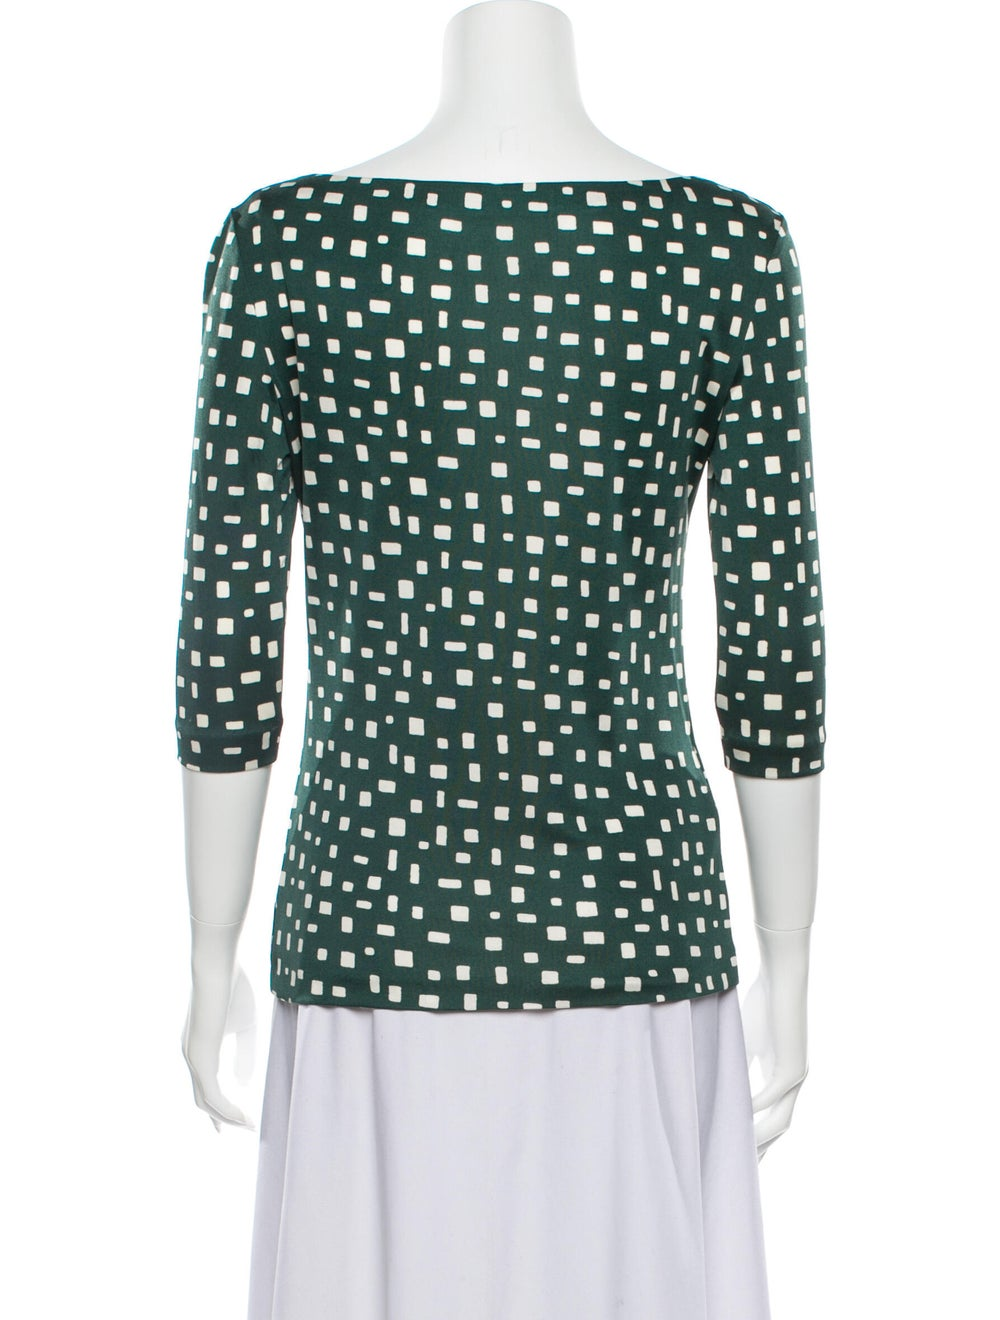 Prada 2013 Silk Blouse Green - image 3